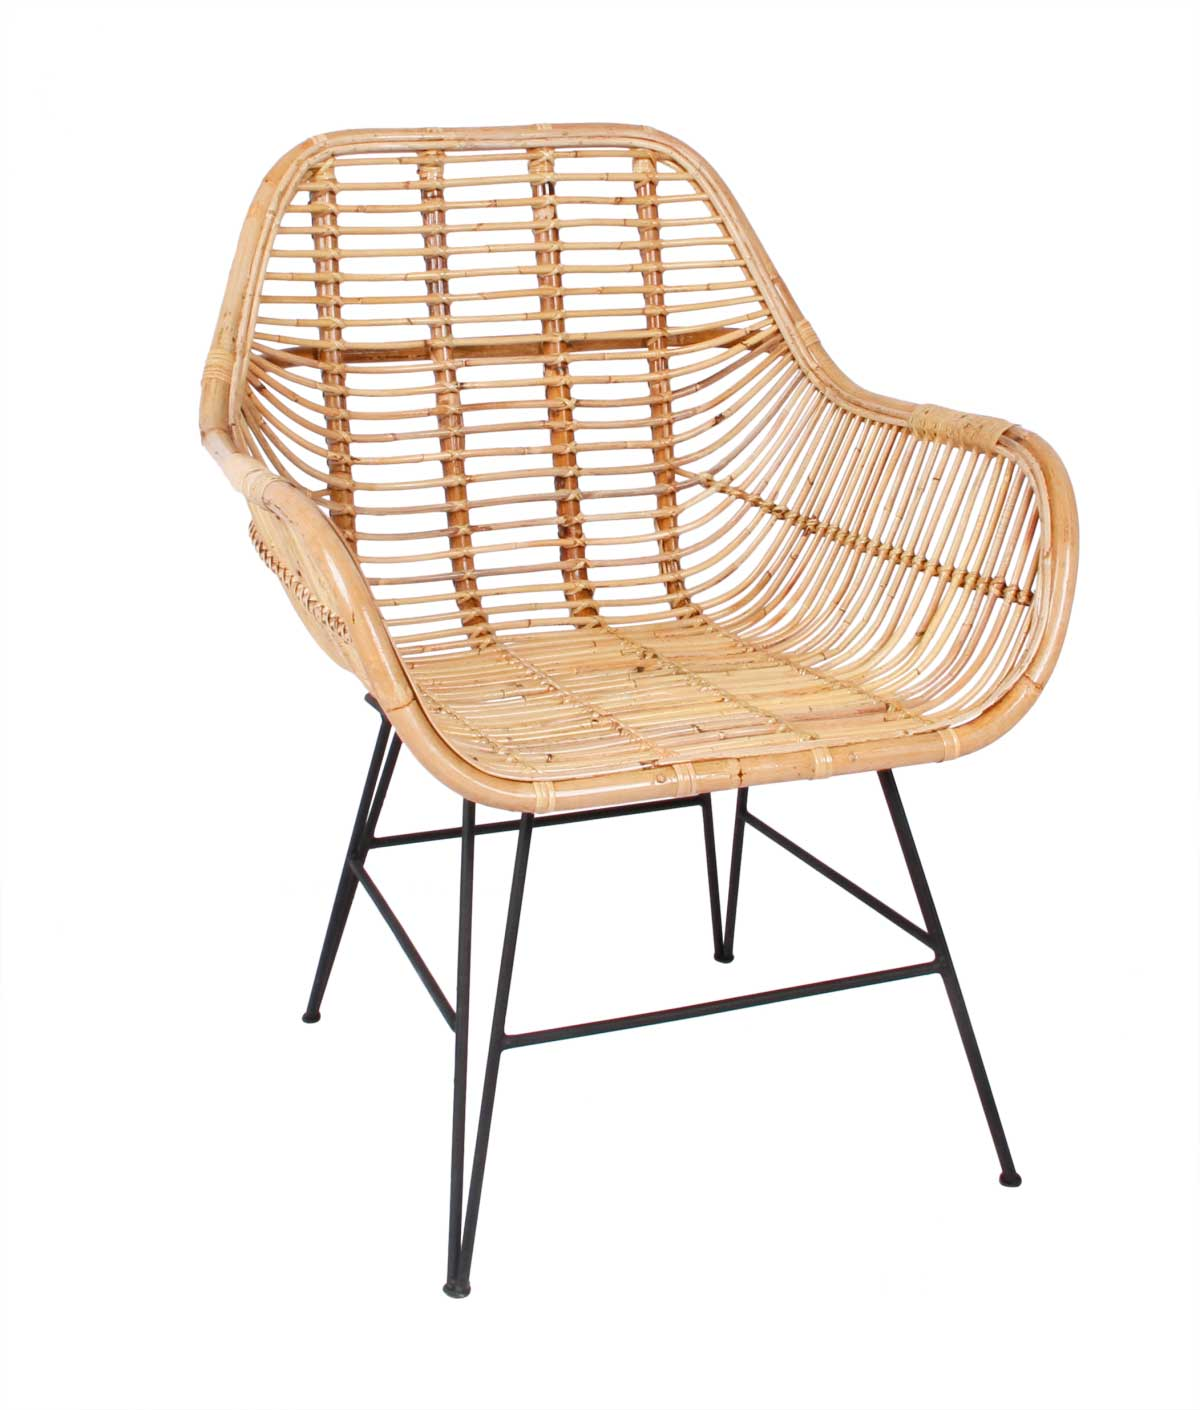 PREFORM Mura spisebordsstol - natur rattan og sort metal, m. armlæn